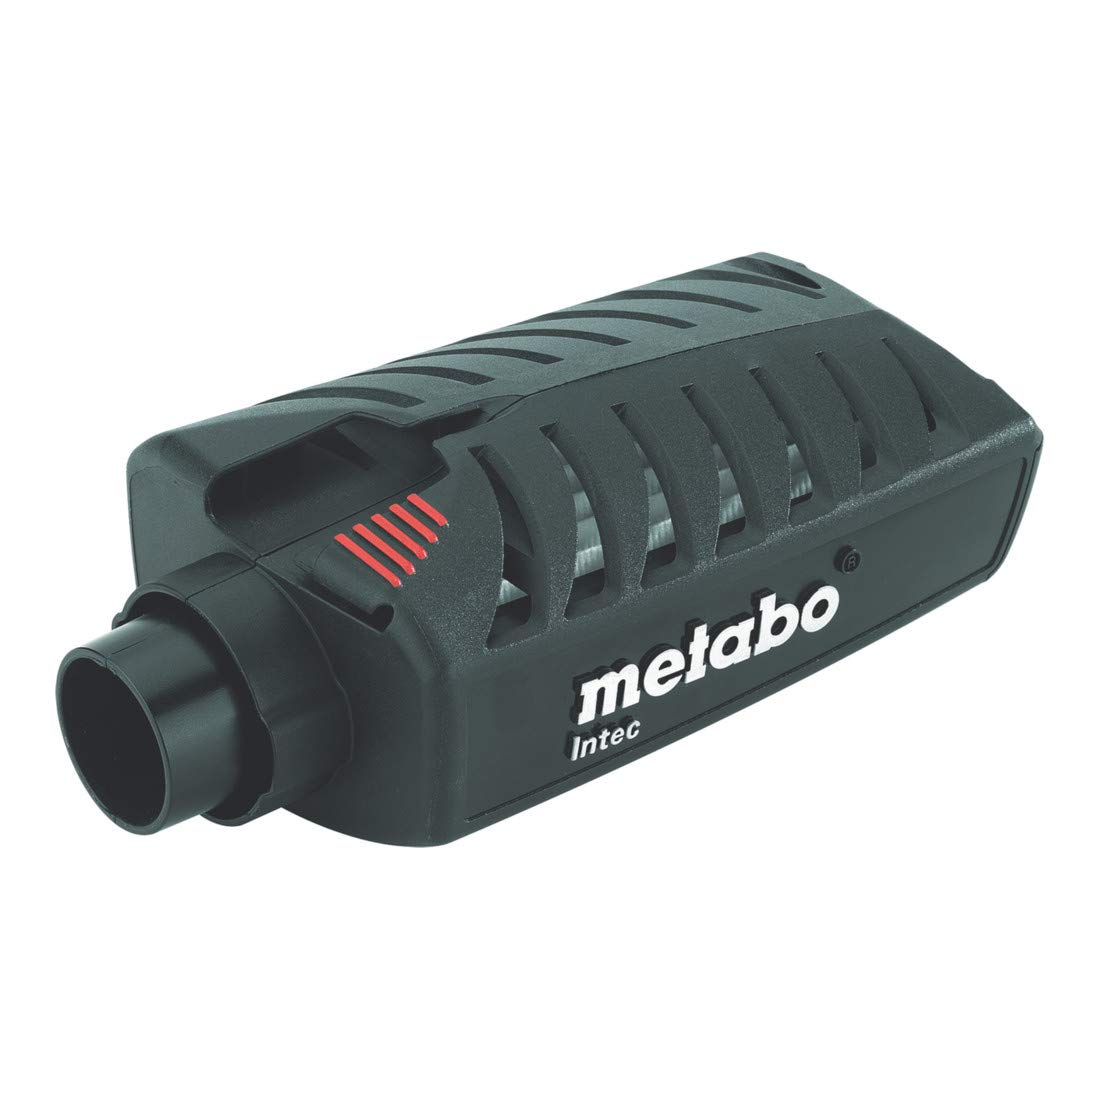 Metabo 625599000 Staubauffangkassette f.SXE 450 TurboTec Metabowerke GmbH